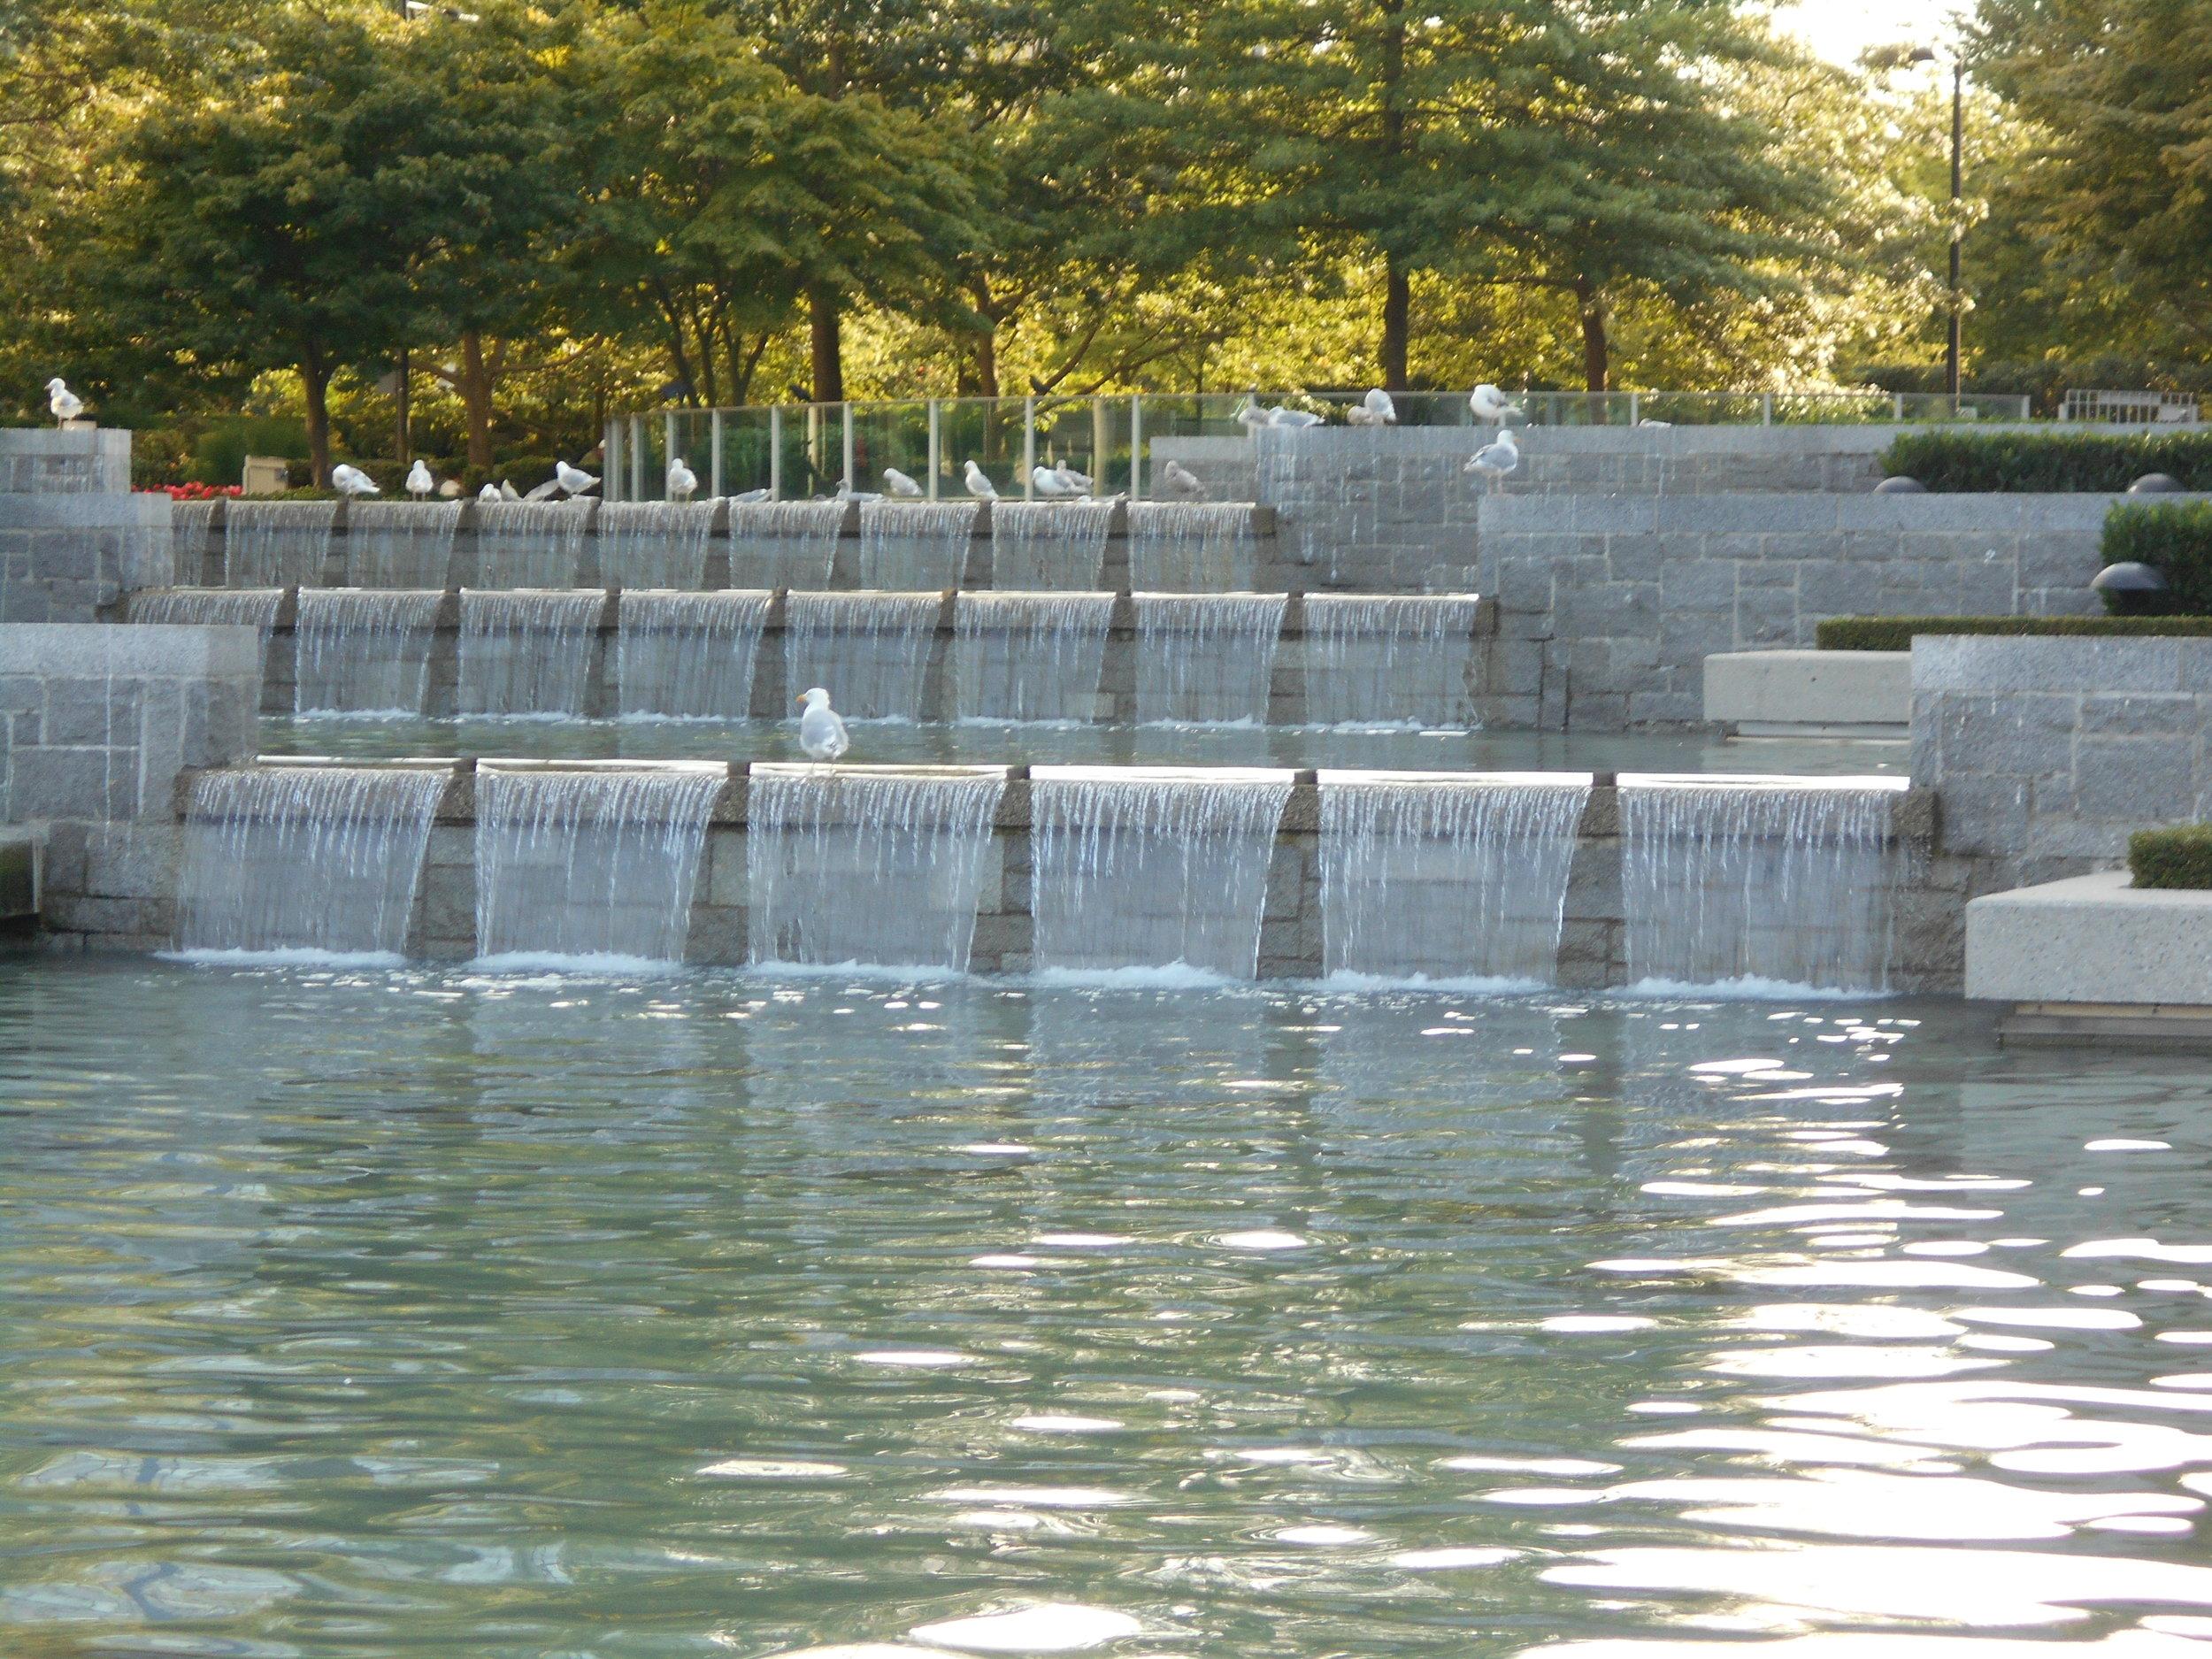 Seagulls love a good waterfall ... like this one near Change restaurant.